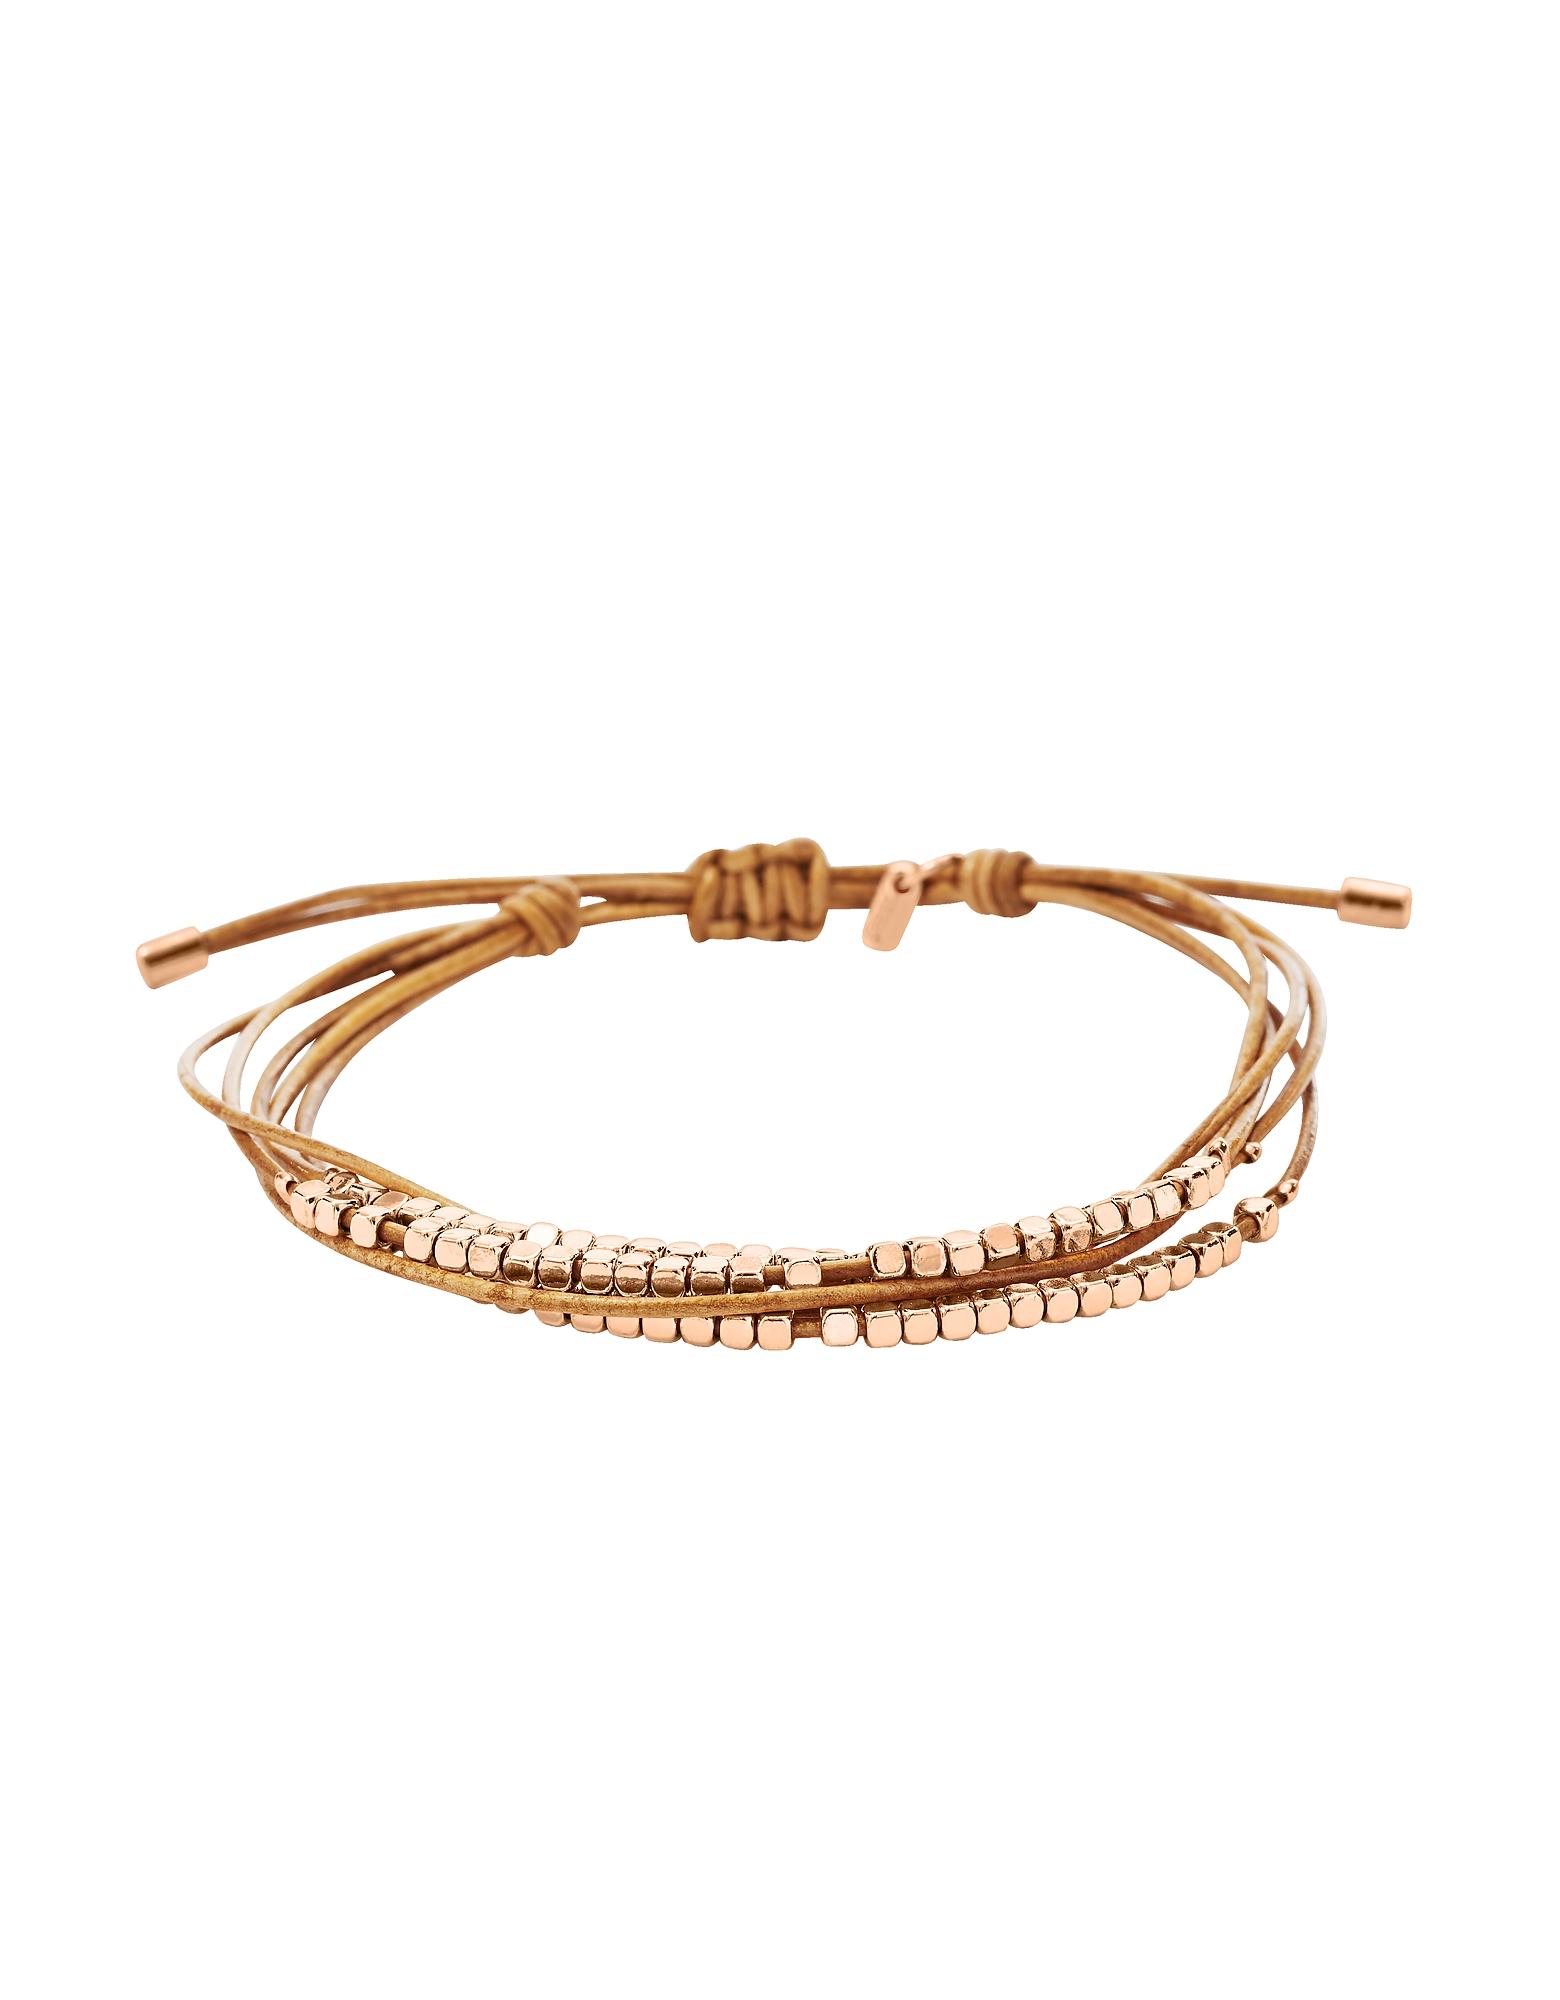 Fossil Designer Bracelets, Rose Gold Dainty Rondel Slider Women's Bracelet